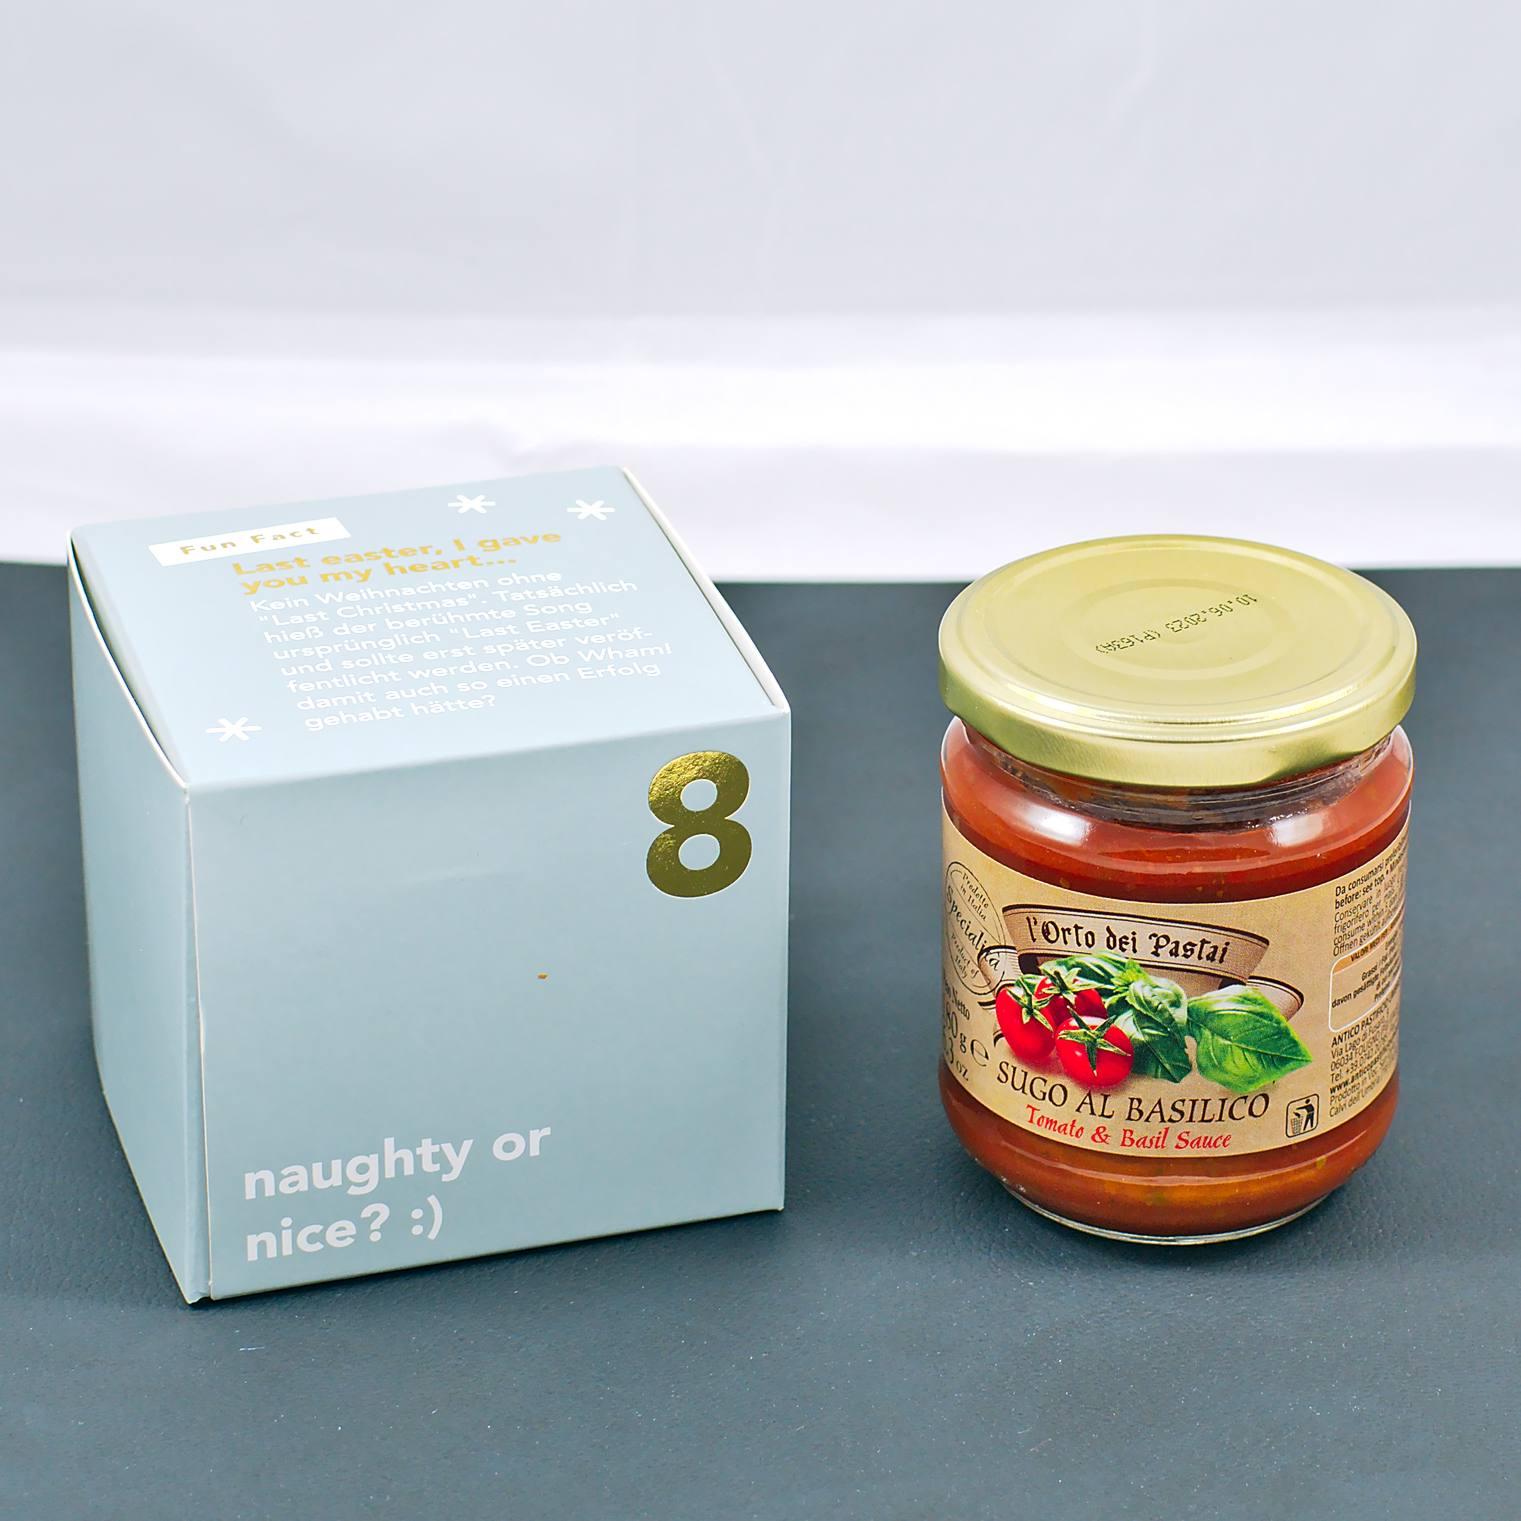 Tomaten & Basilikum Sauce von Antico Pastificio Umbro   8. Türchen